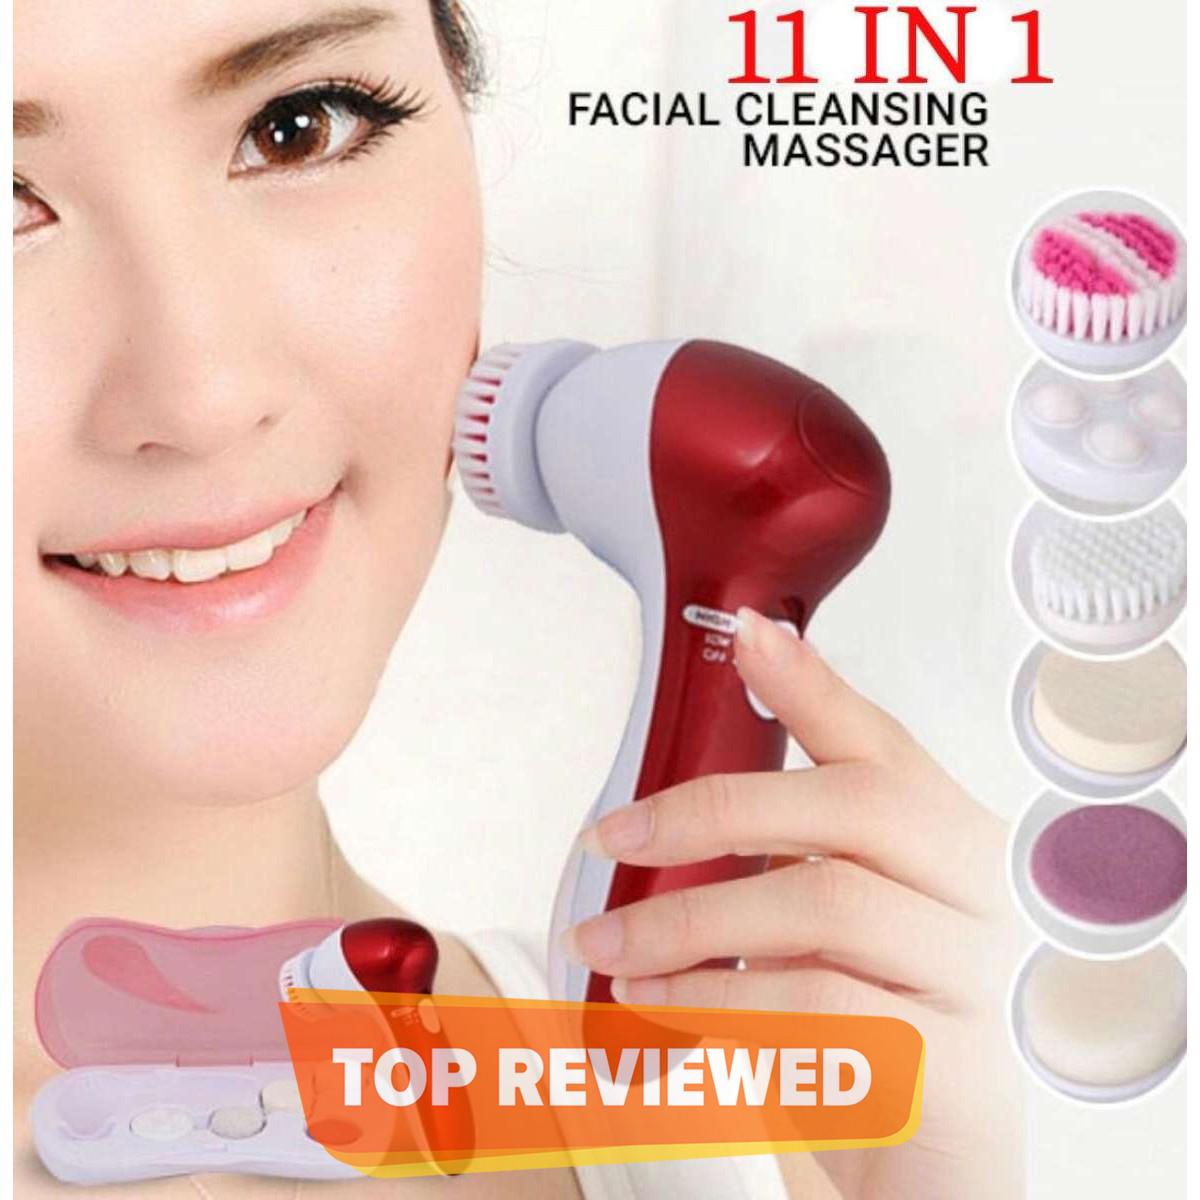 Massager 11 in 1 Face Facial Exfoliater Electric Massage Machine Care